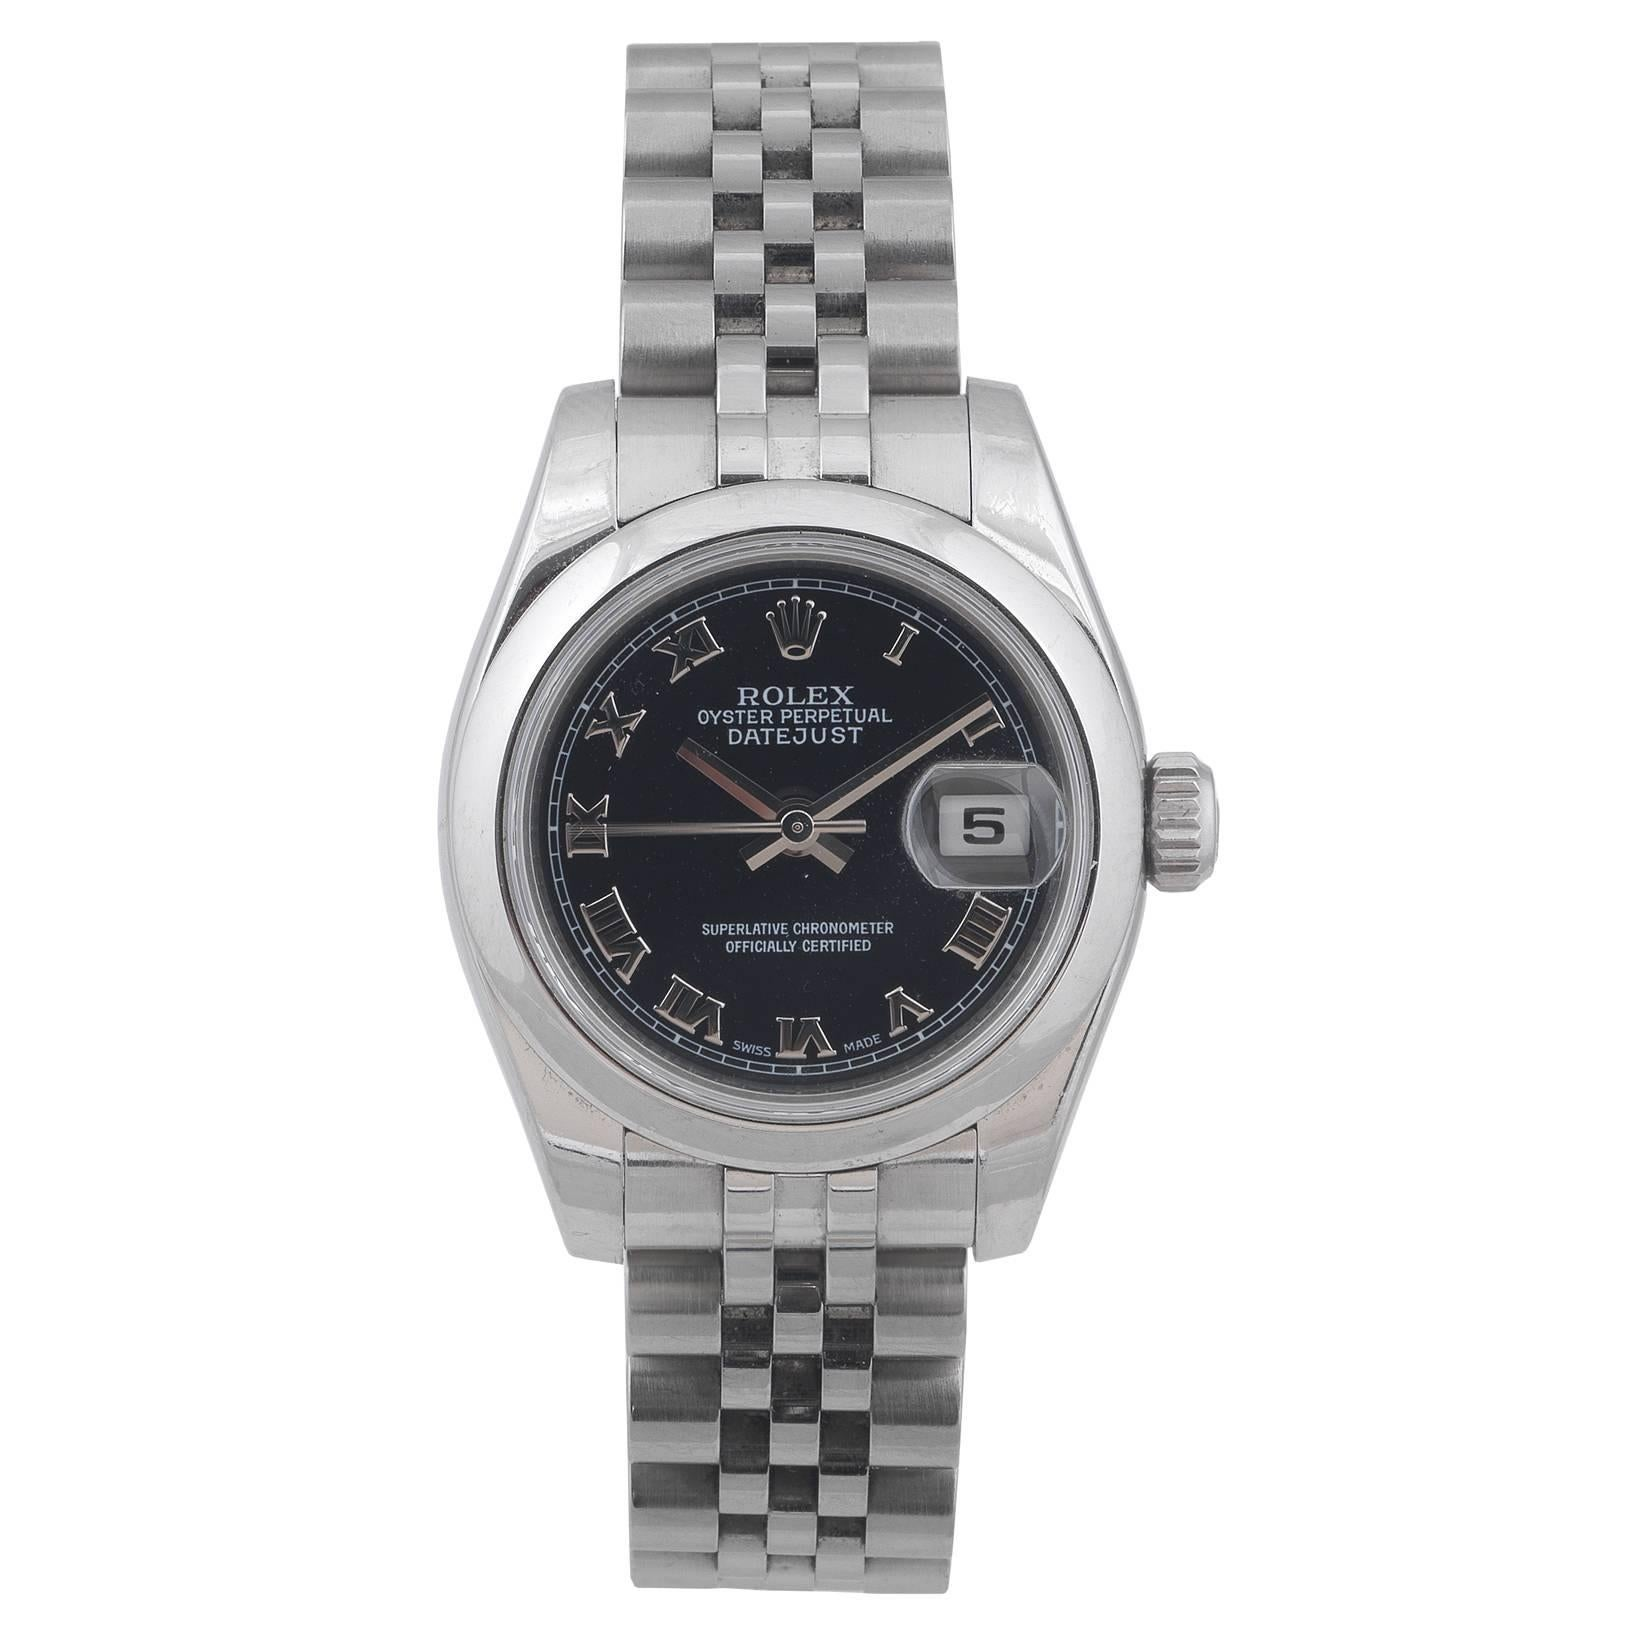 Rolex Ladies stainless steel Datejust Ref. 179160 Automatic Wristwatch, 2006